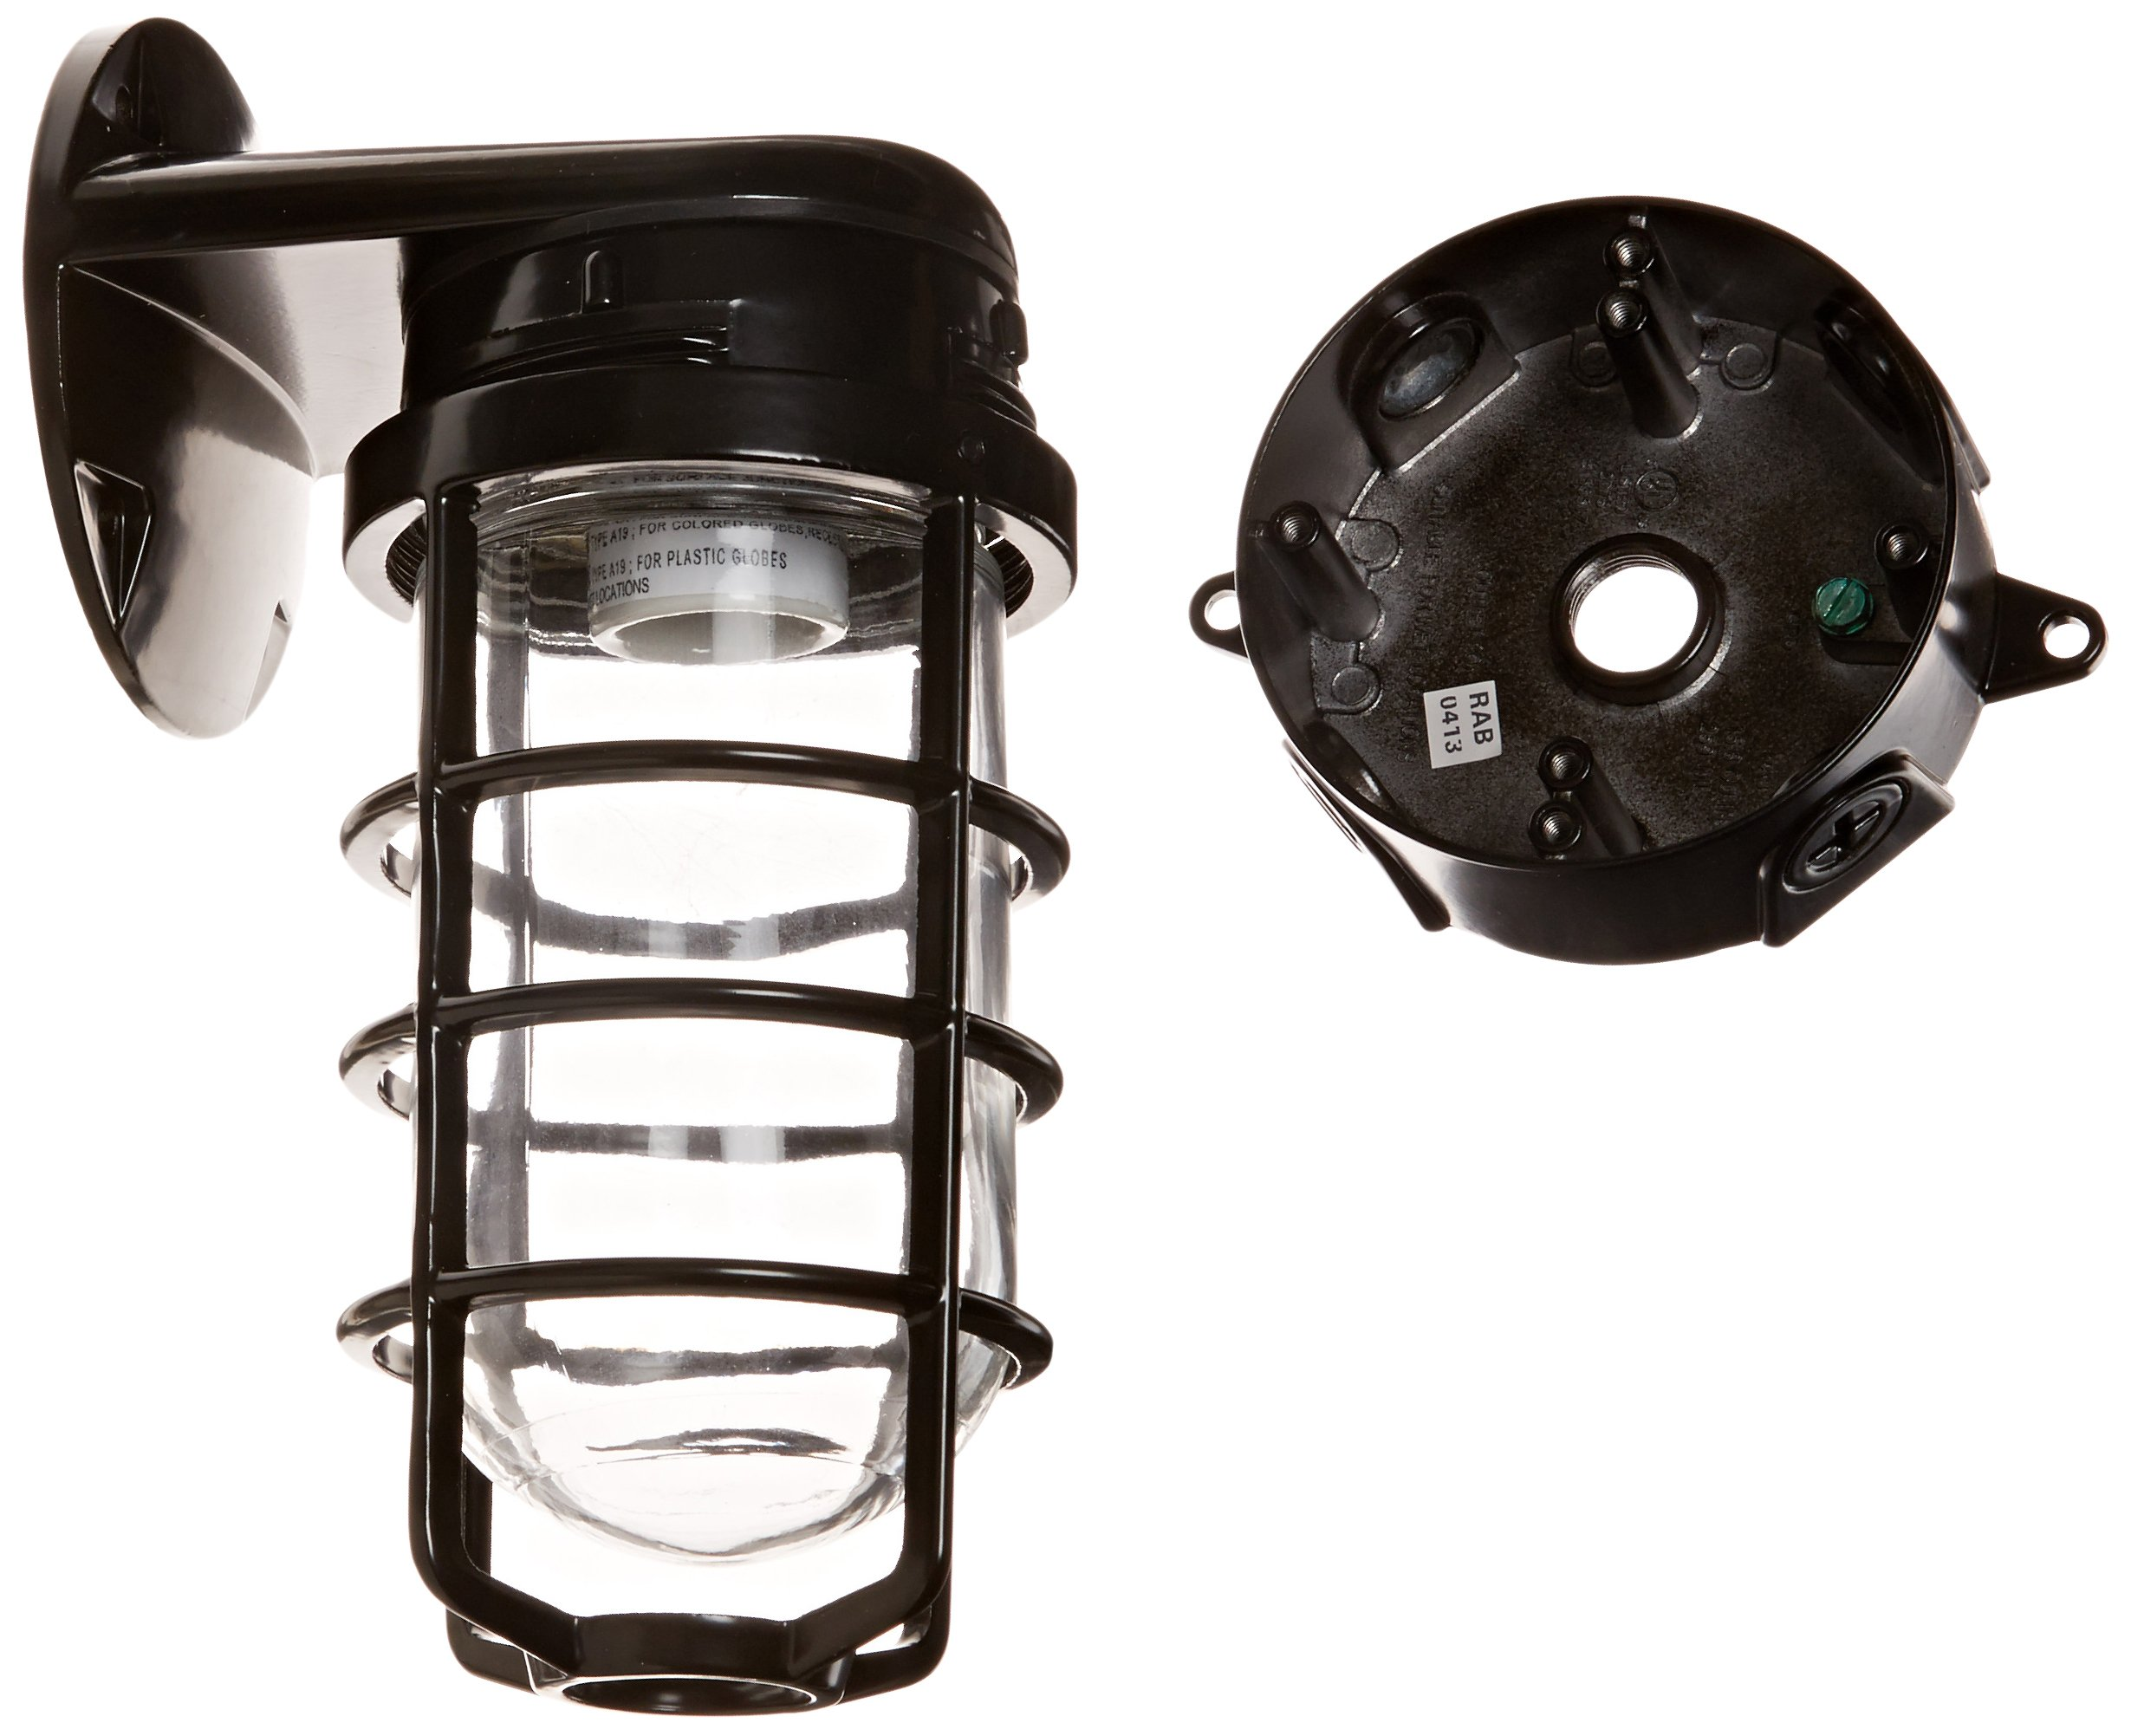 RAB Lighting VXBR100DGB Vaporproof VXBR 4'' Wall Bracket with Glass Globe and Cast Guard, A19 Type, Aluminum, 150W Power, 1/2'' Hub, Black by RAB Lighting